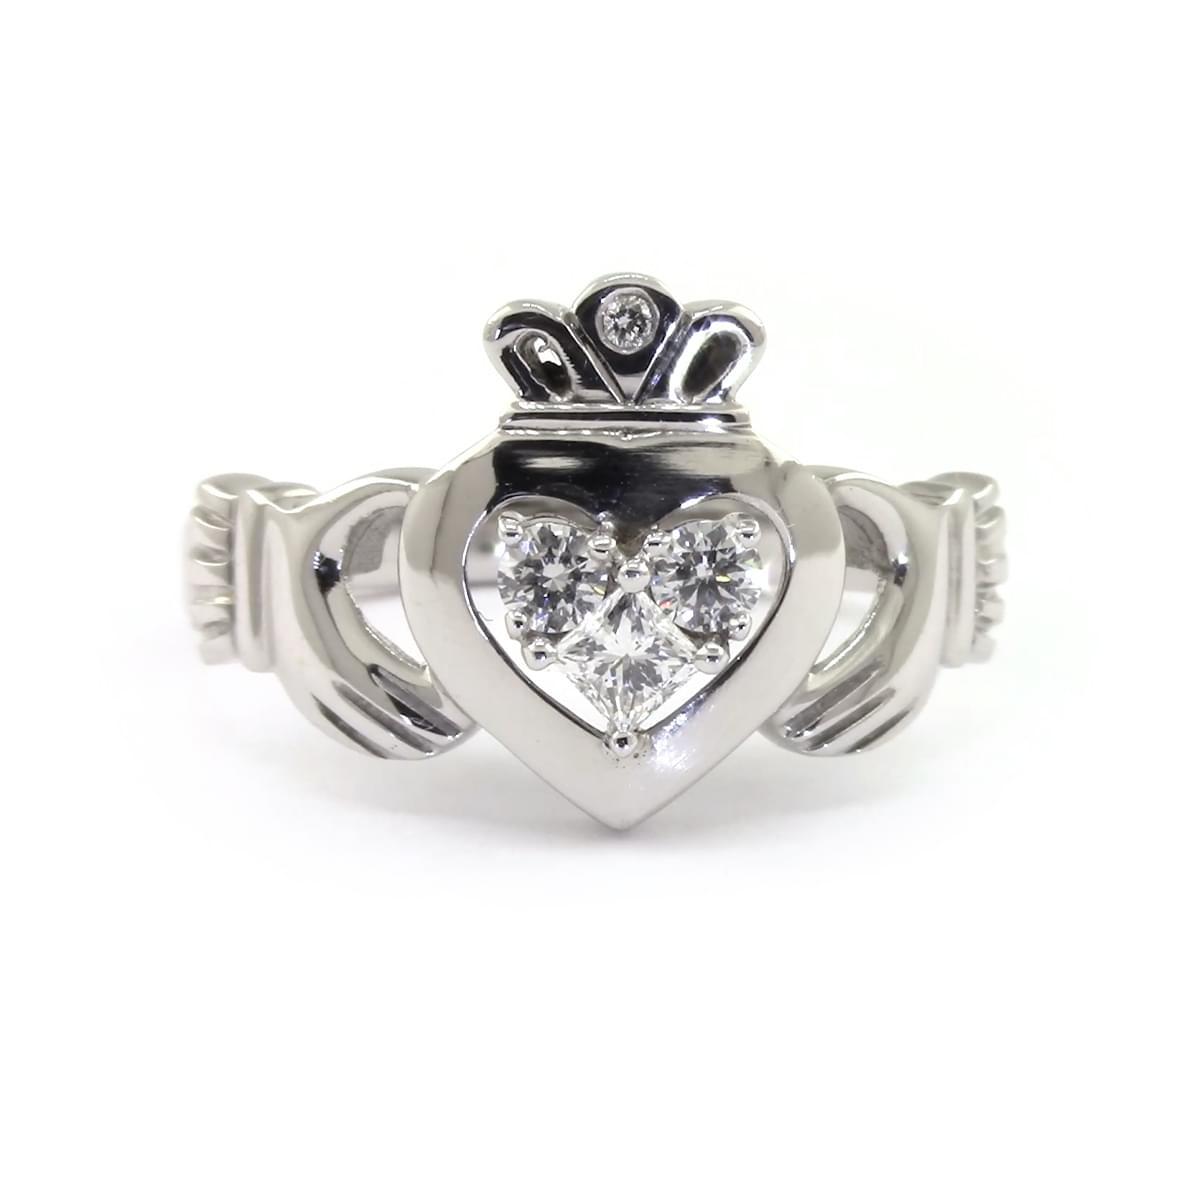 14k White Gold 3 Stone Ring